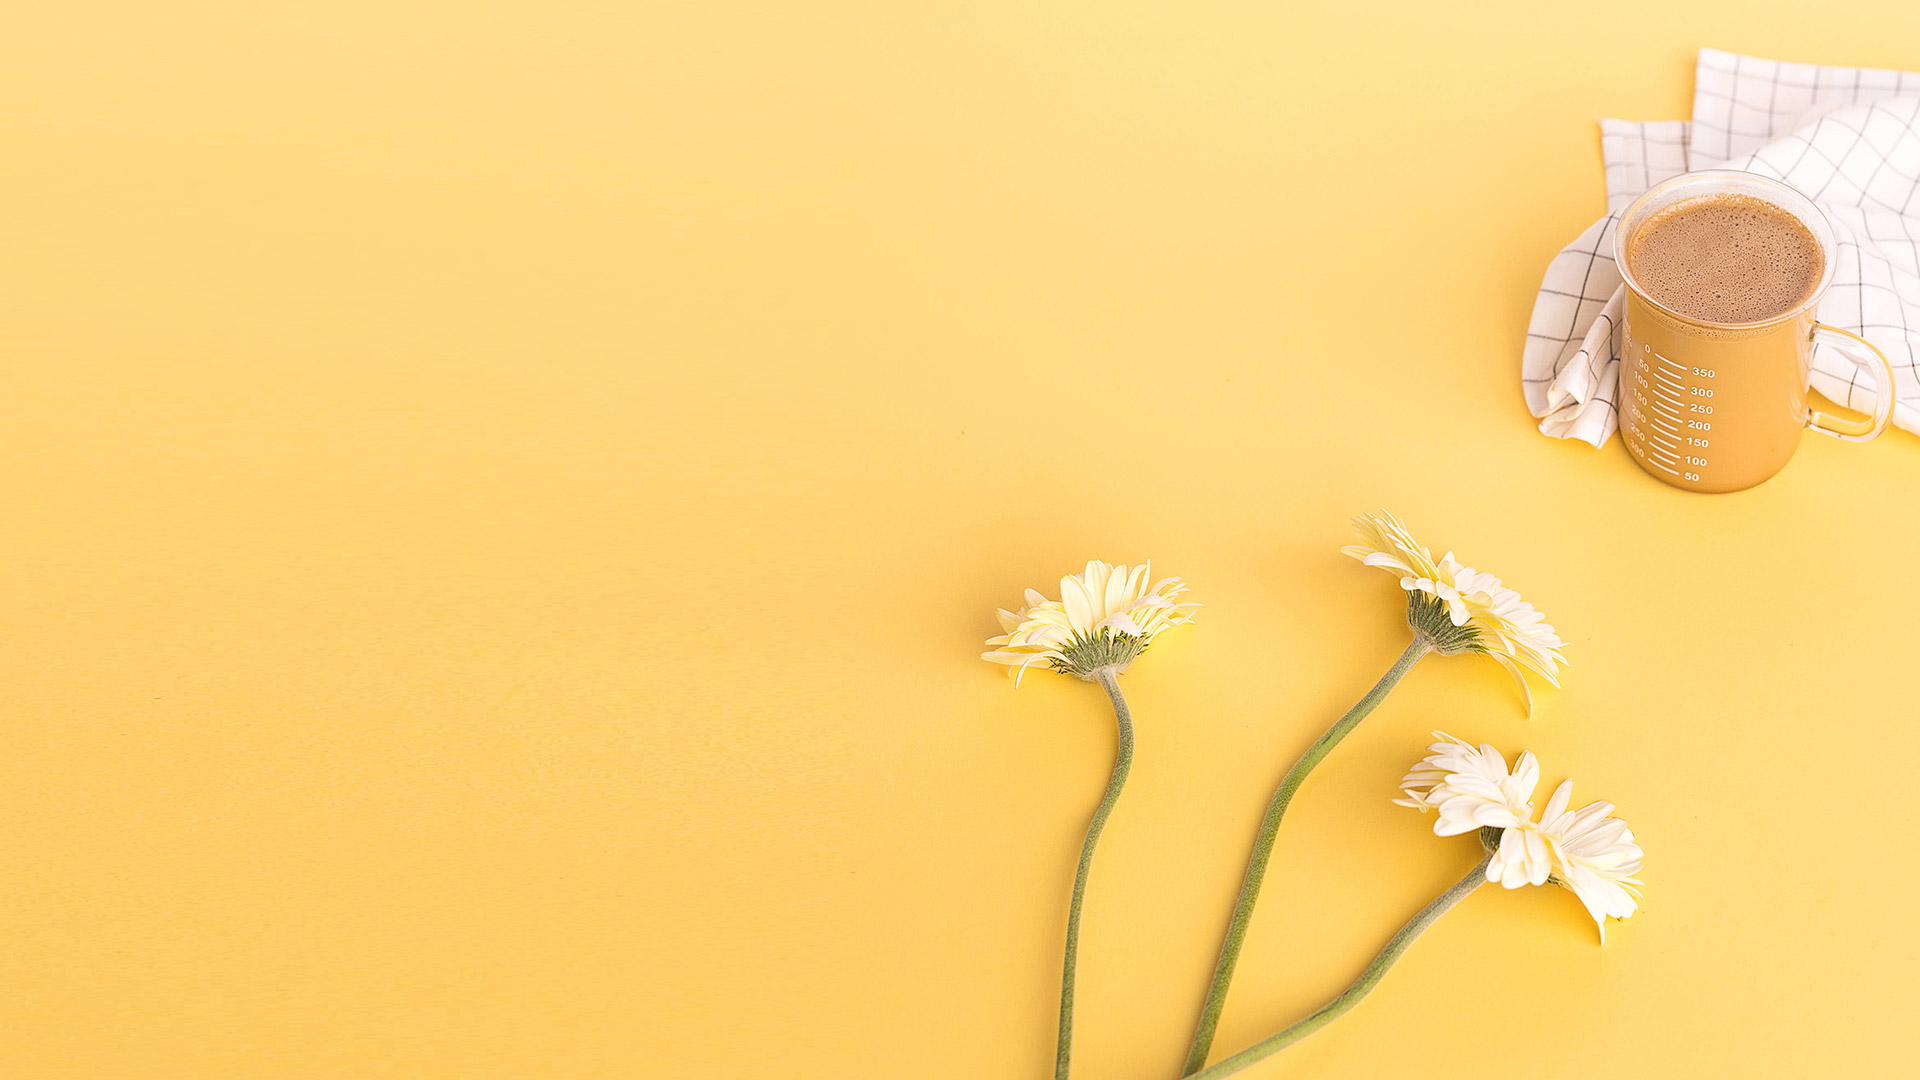 HD-Image-108.jpg